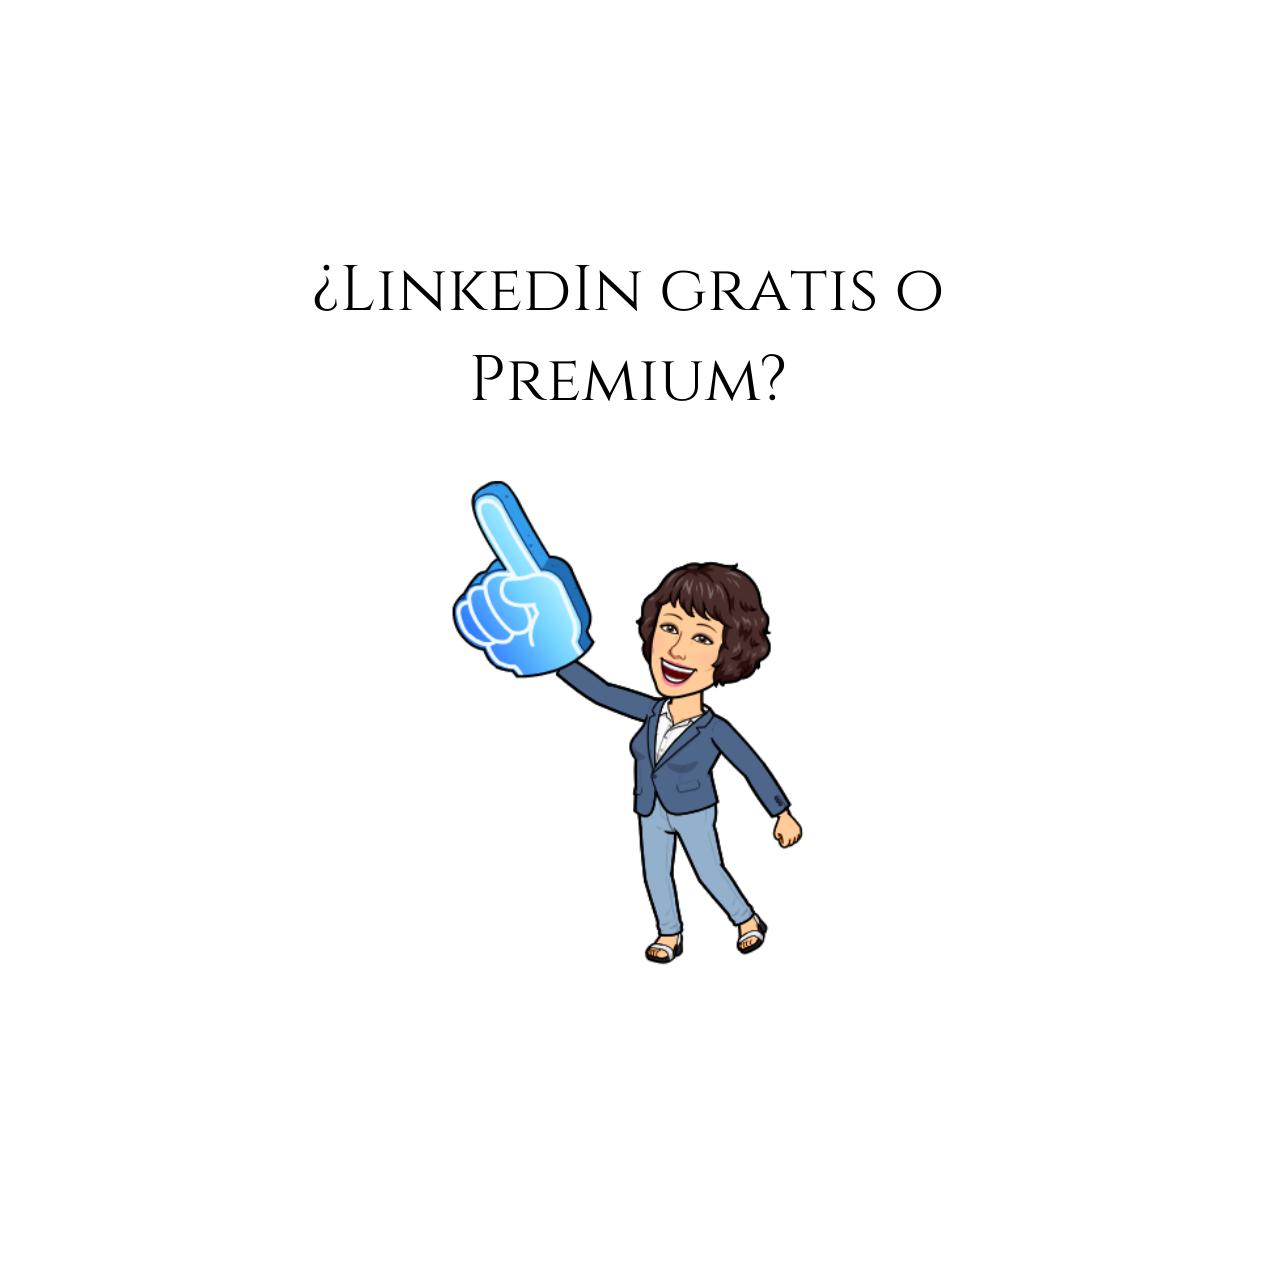 Linkedin gratis o premium